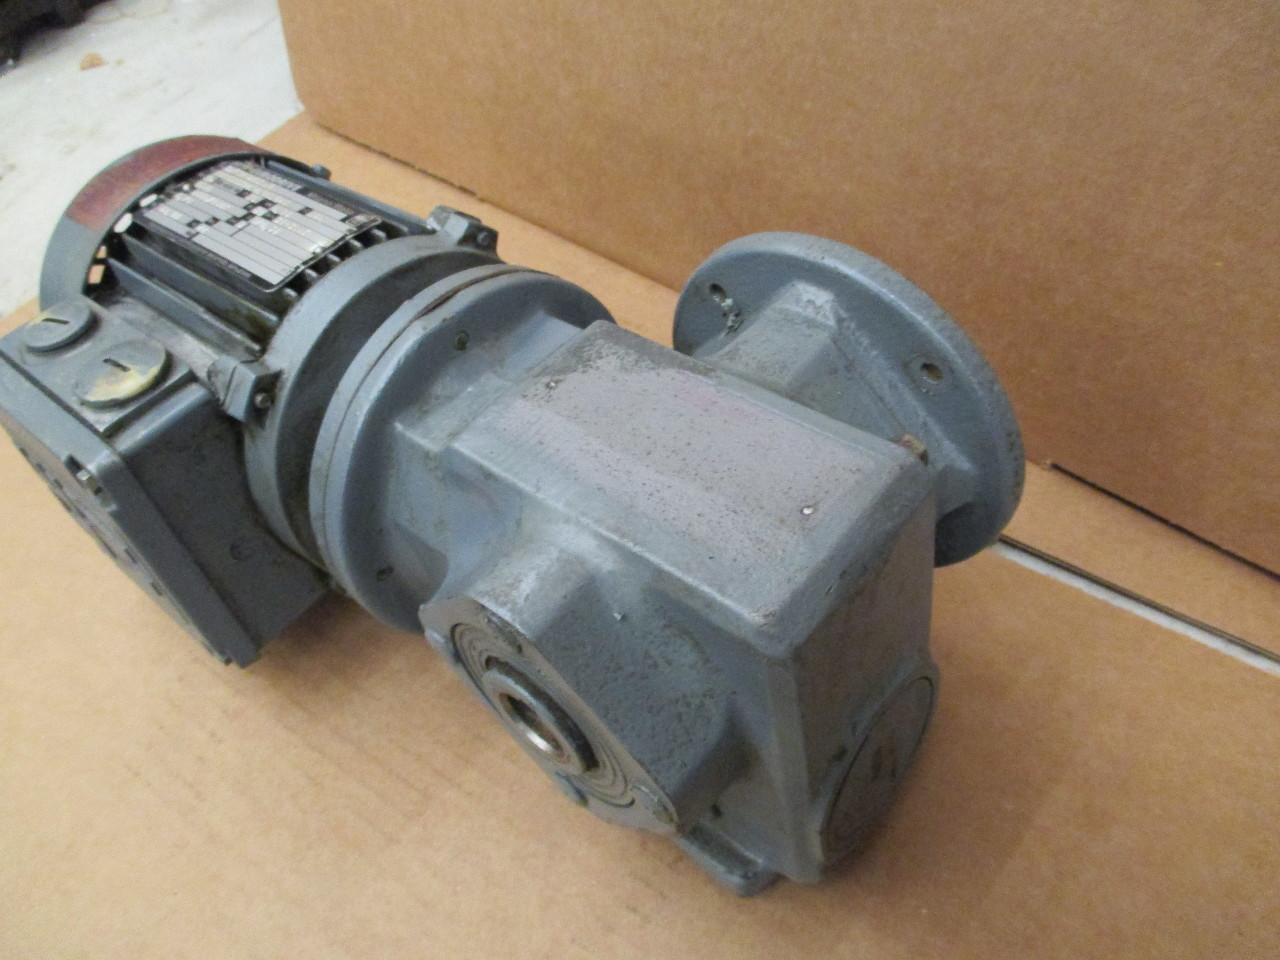 Sew eurodrive gear reducer motor type saf32 d63 n4 for Sew eurodrive gear motor